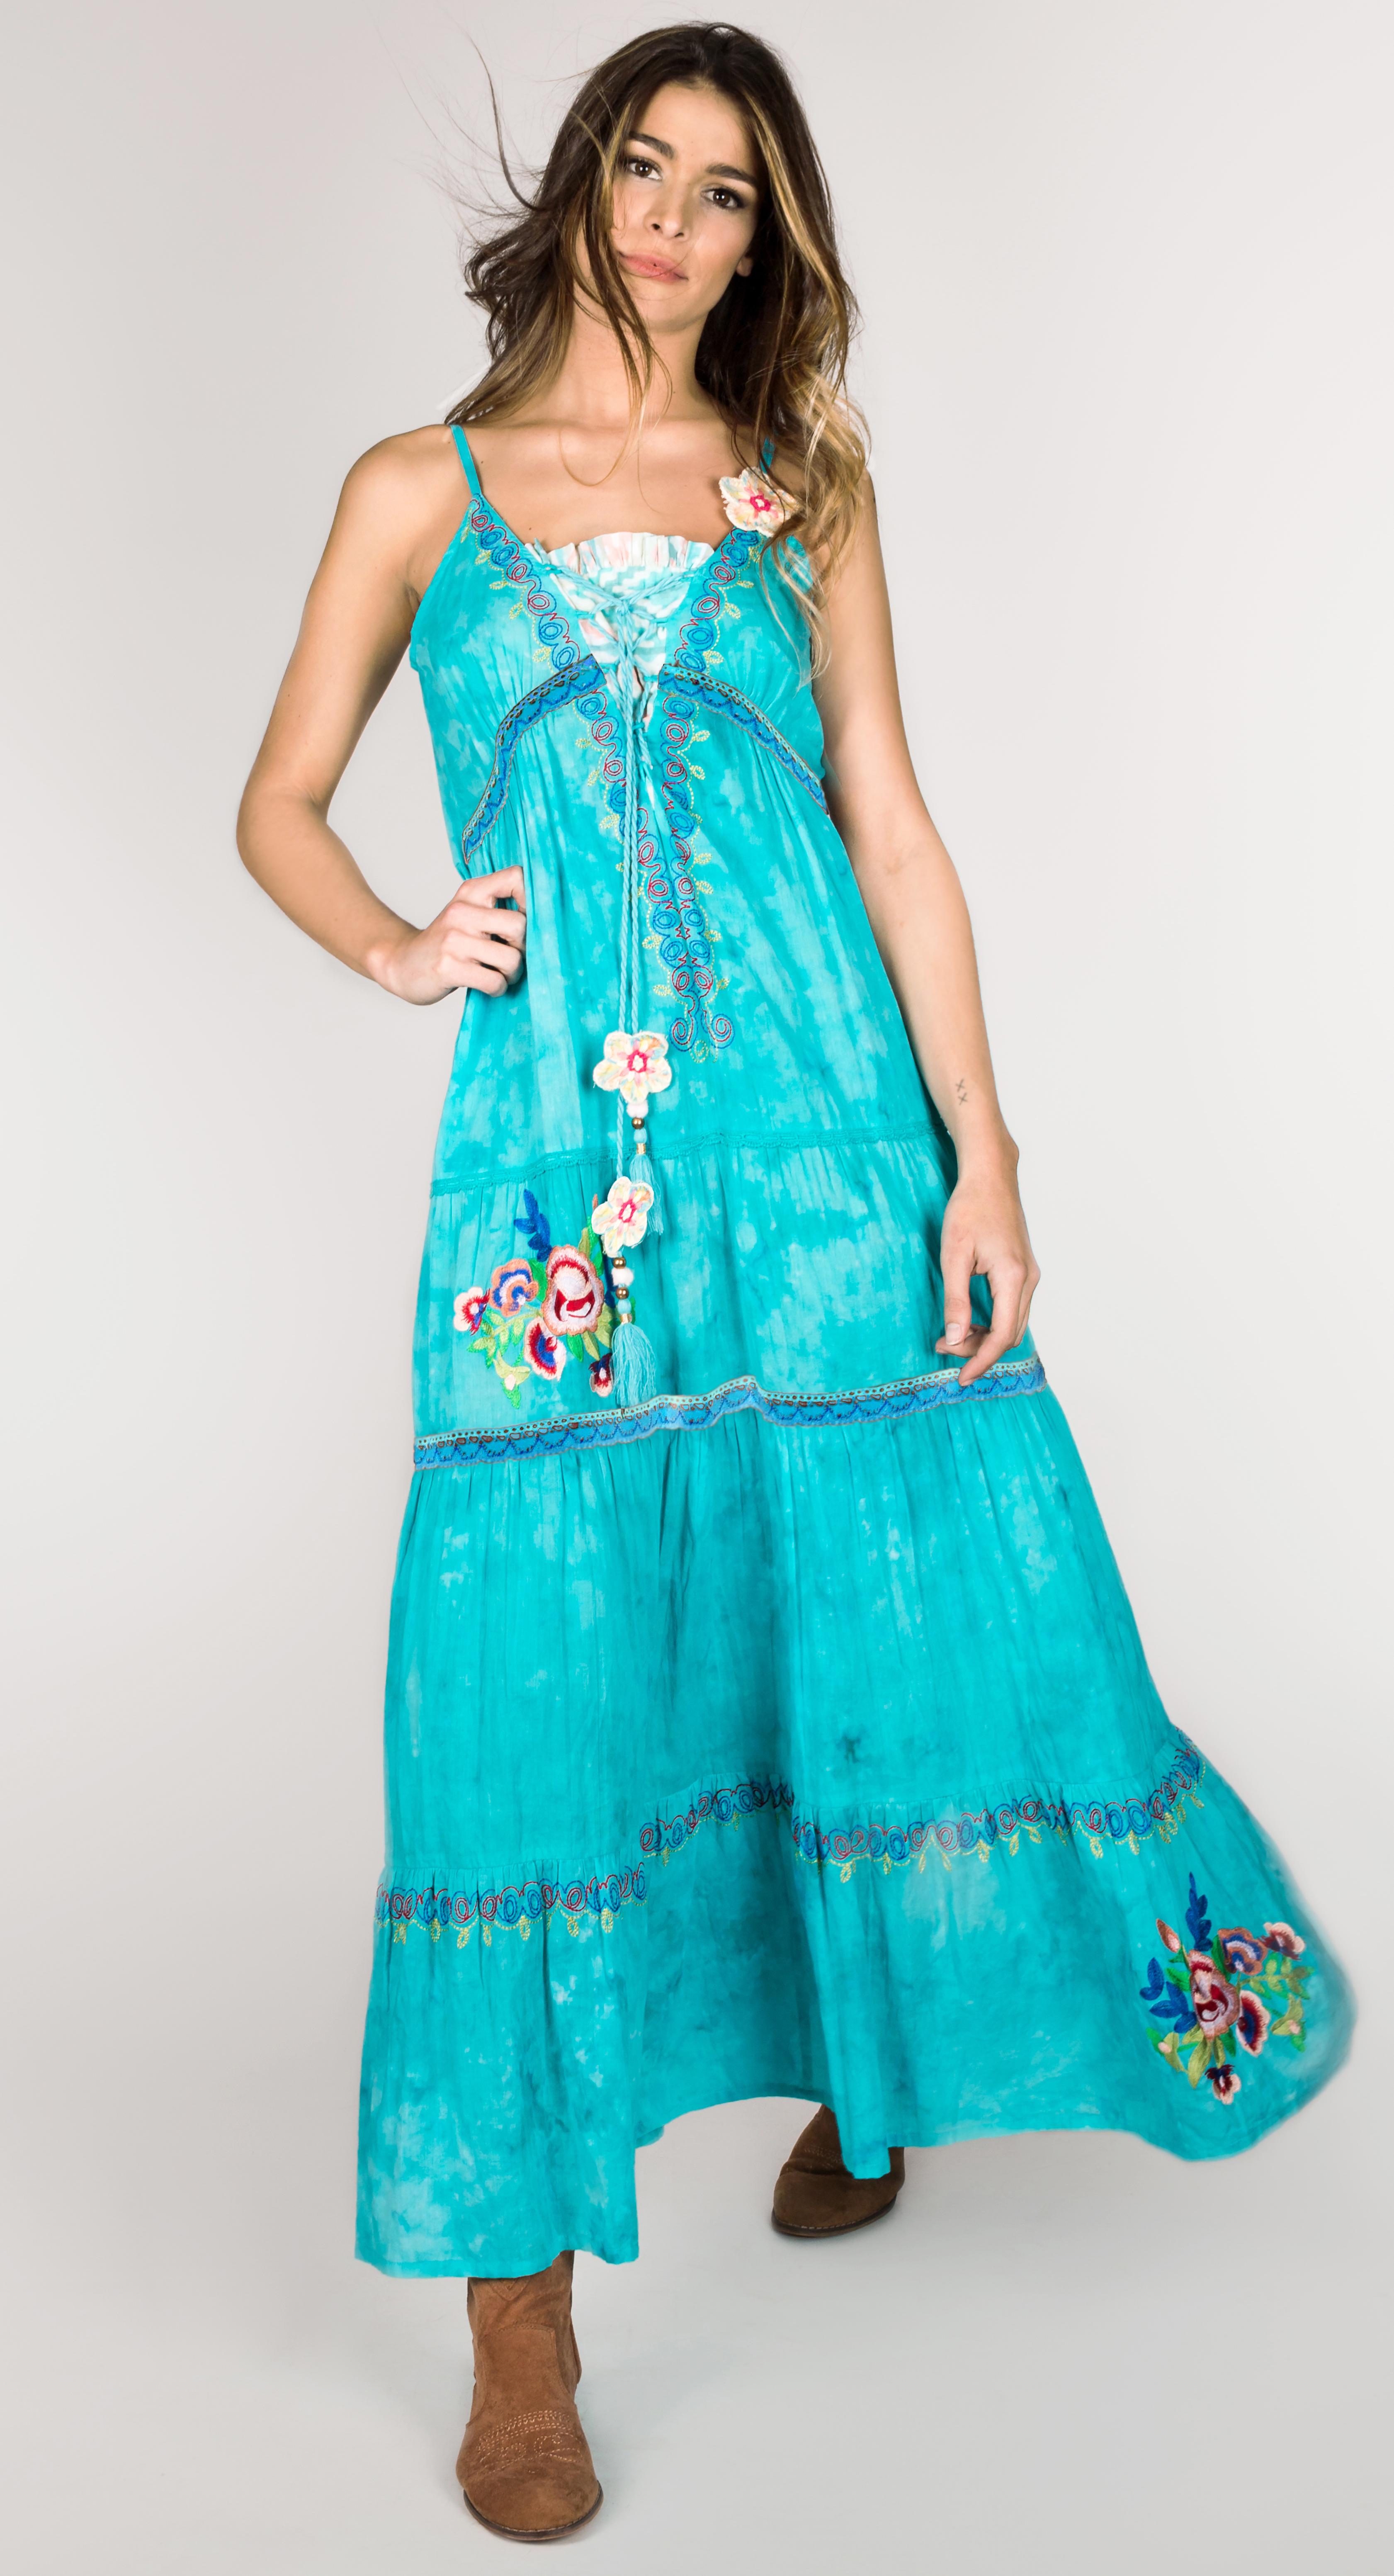 Shoklett: High Low Corset Tied Bodice Sea Flower Maxi Dress Sherlyn (Few Left!) SHOKLETT_10022S19DR_N2